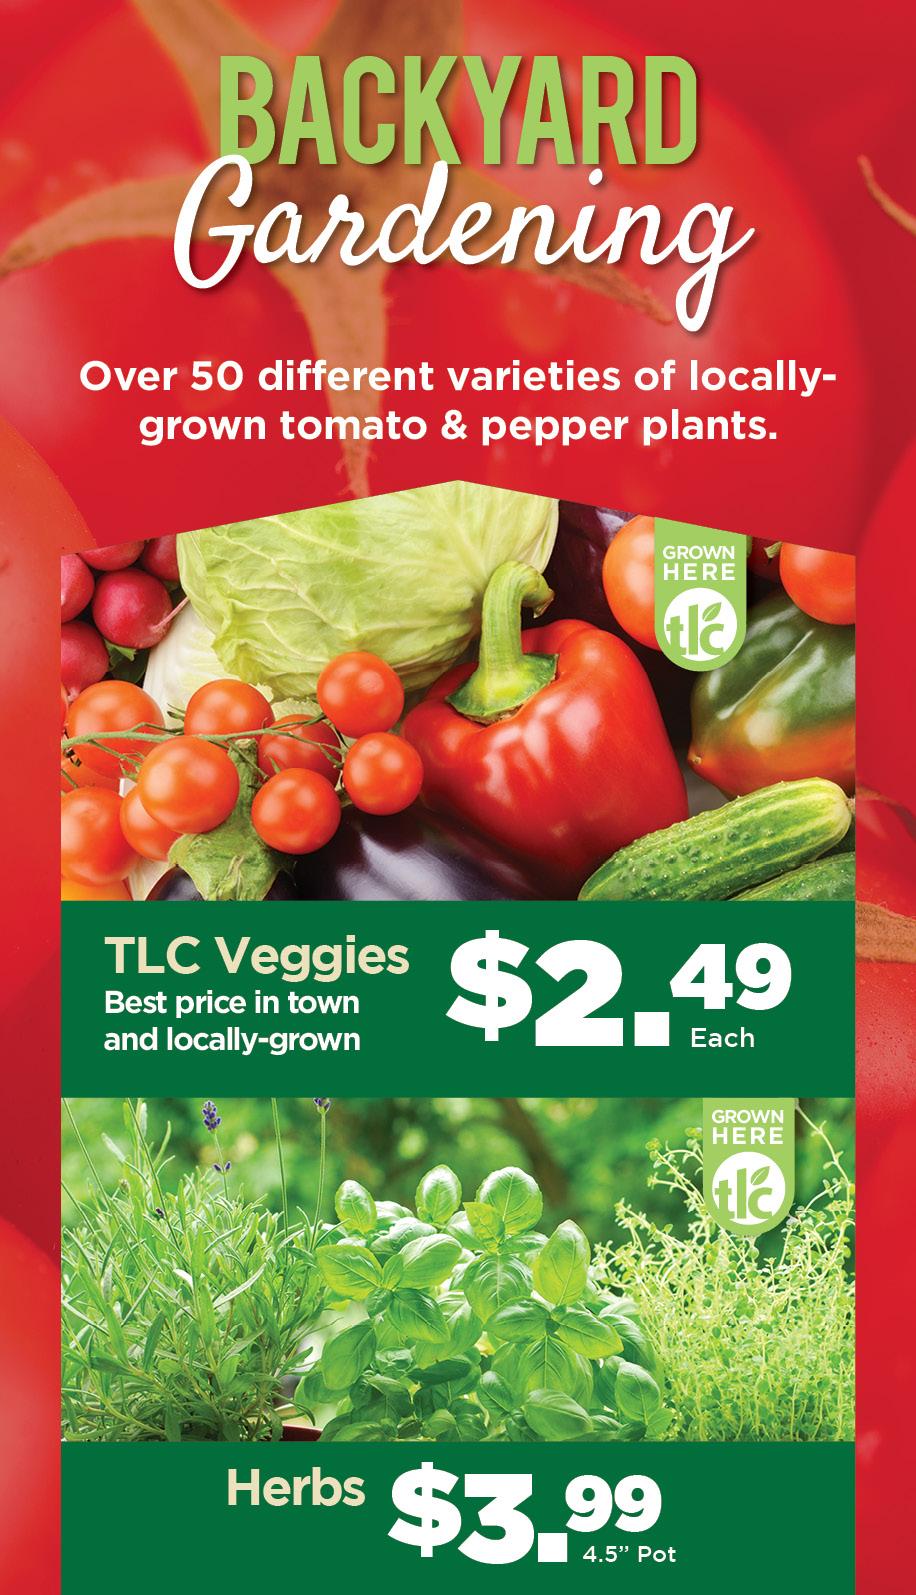 Backyard Gardening | TLC Garden Centers